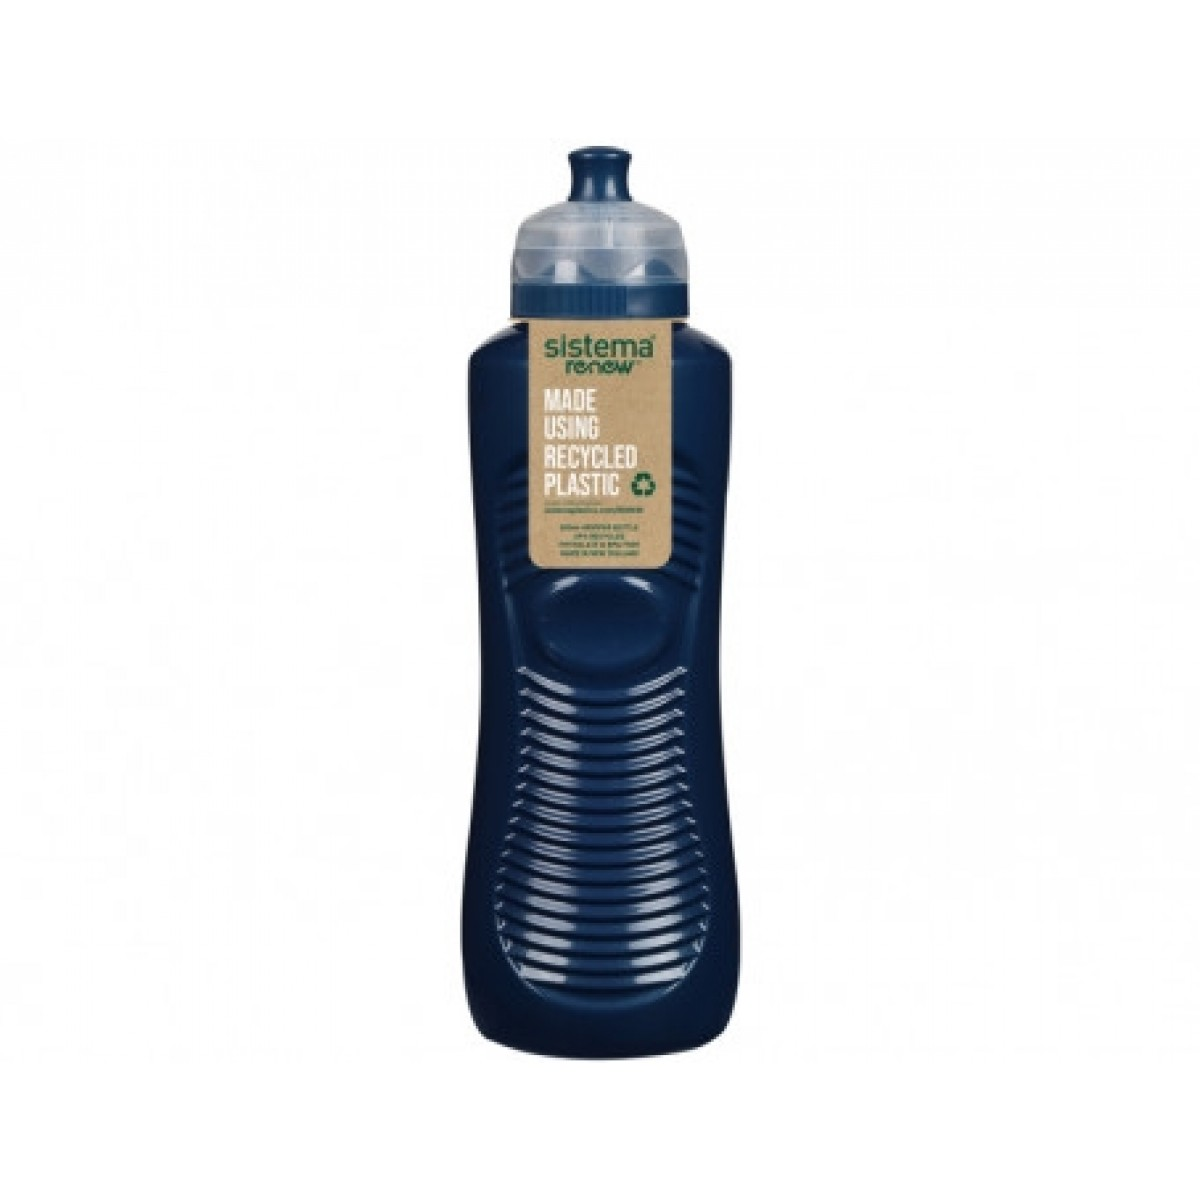 SISTEMA Drikkedunk gripper 800 ml renew - blå